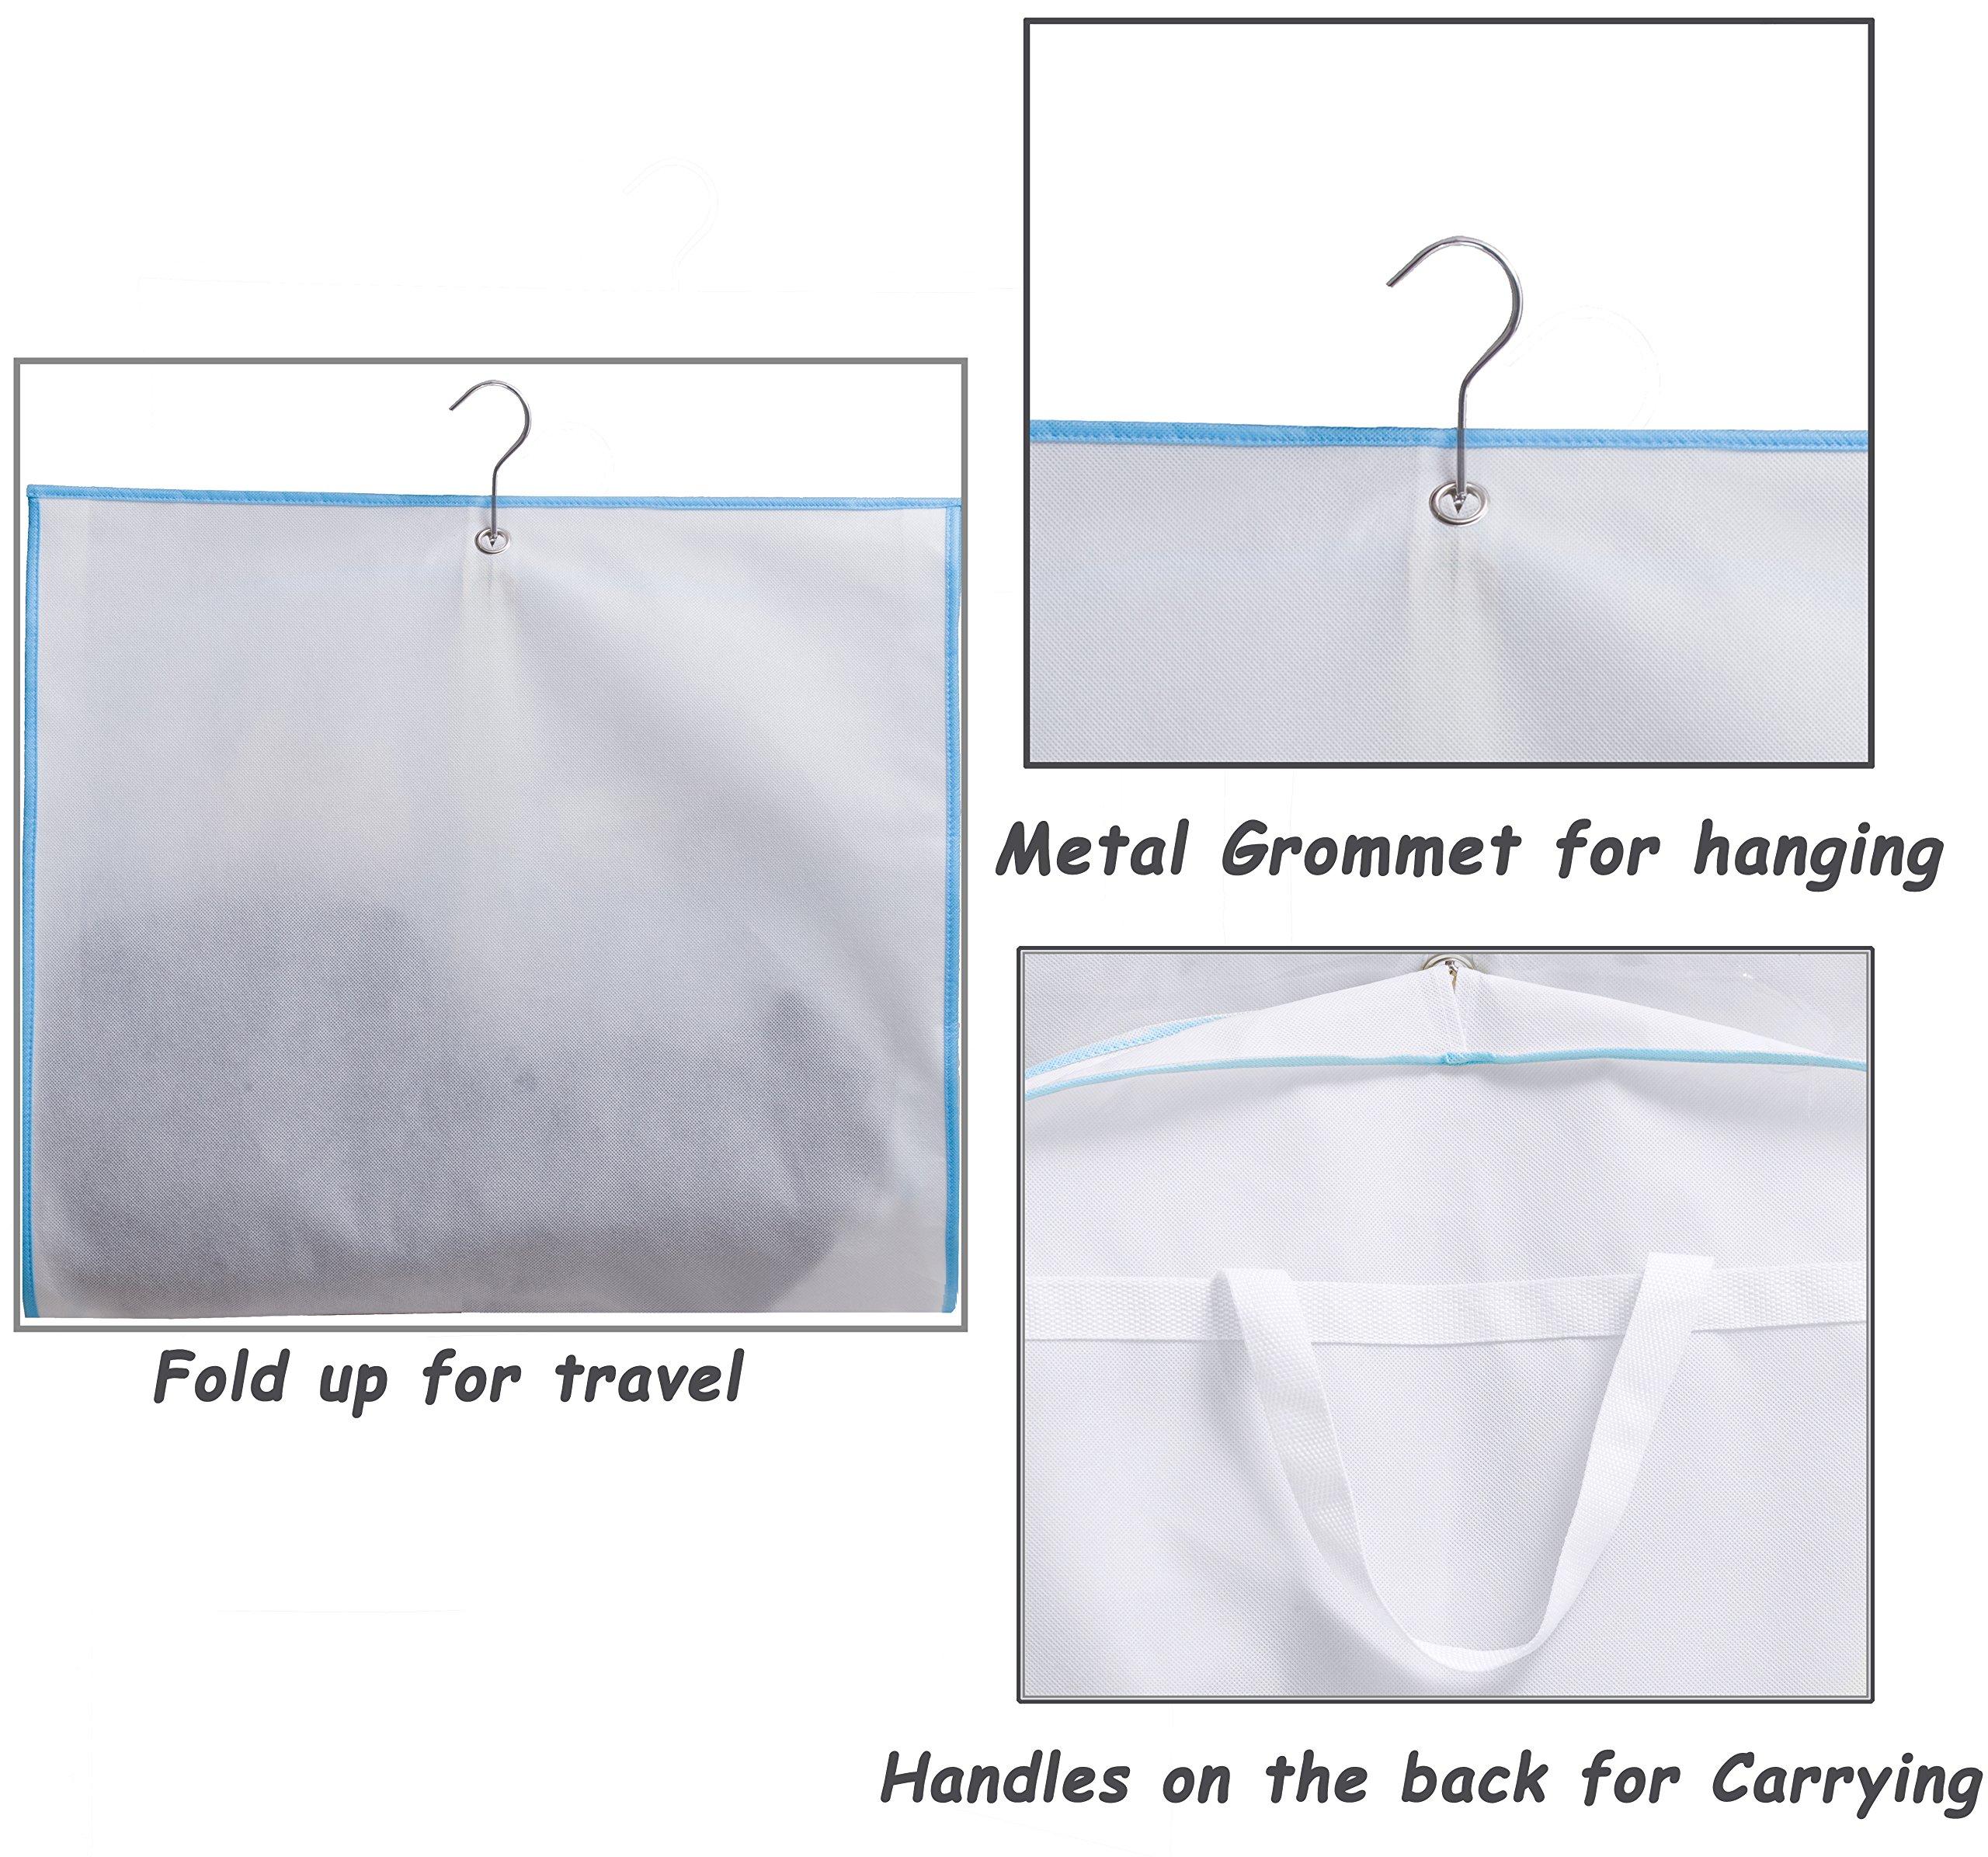 Kimbora 40'' Travel Dance/Dress Costume Garment Bag with Clear Accessories Zipper Pockets Suit Garment Cover (White) by KIMBORA (Image #5)